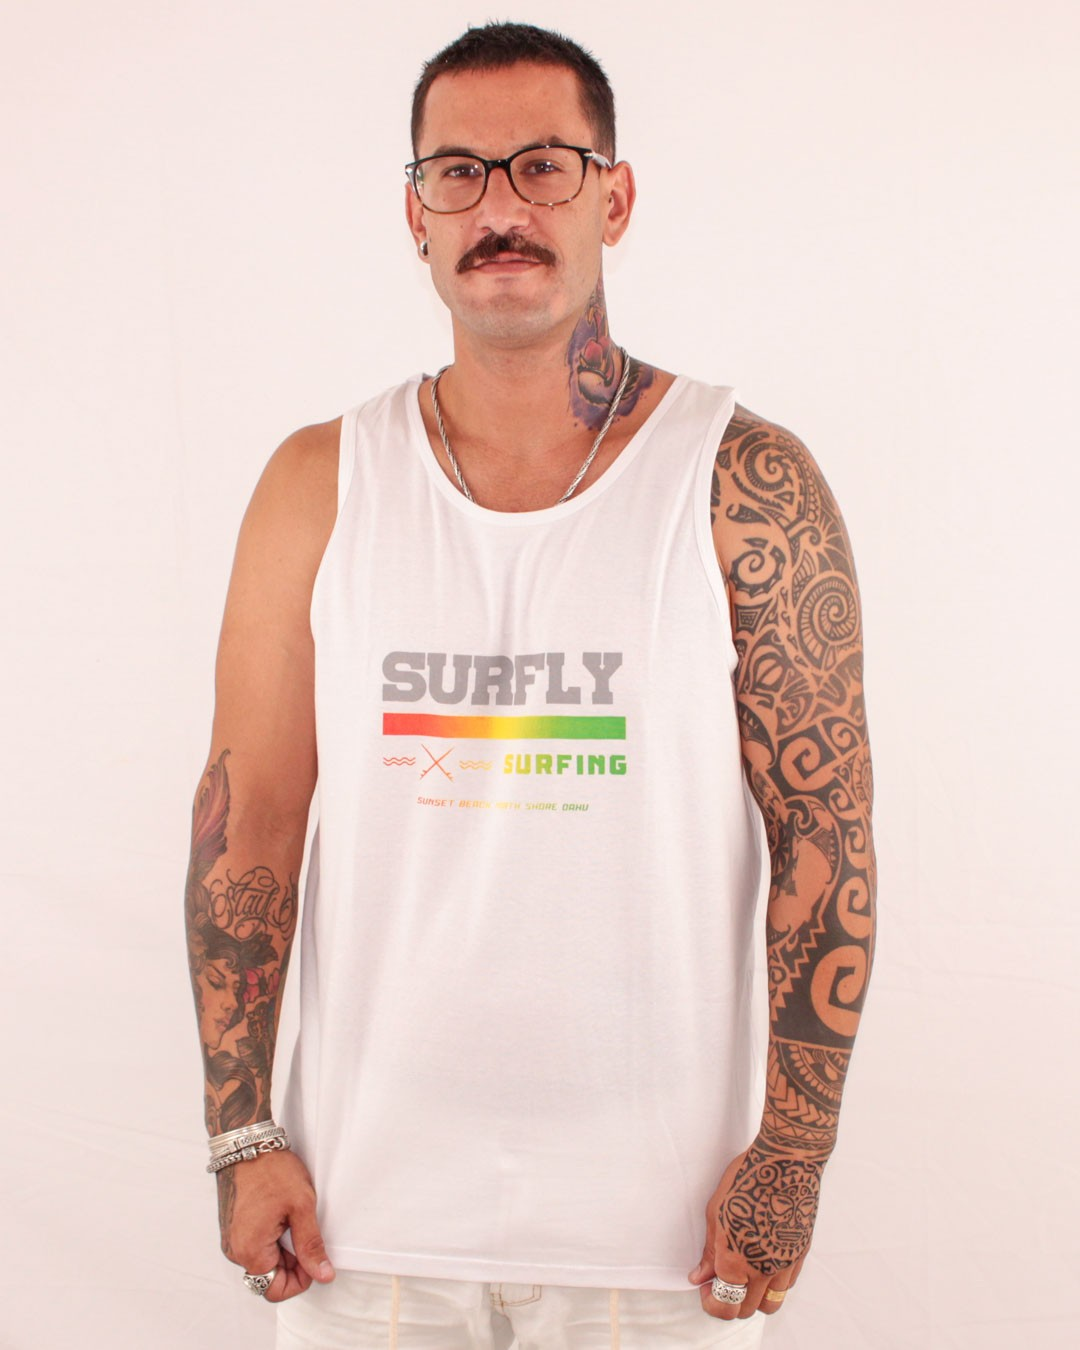 CAMISETA REGATA SURFLY SURFING BRANCA - SURFLY